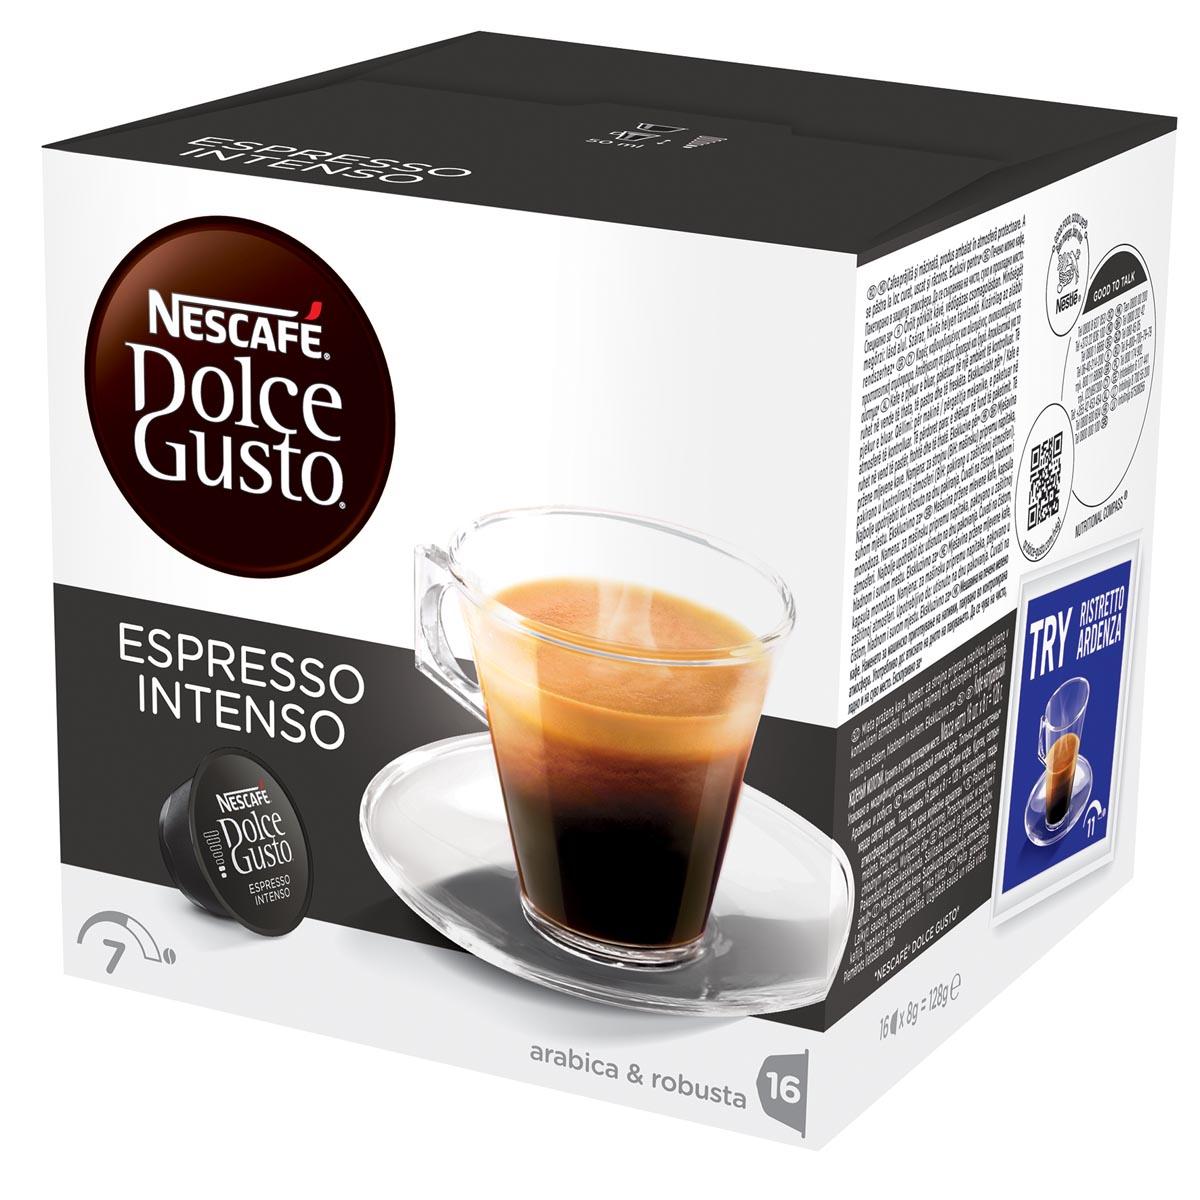 Nescafé Dolce Gusto koffiepads, Espresso Intenso, pak van 16 stuks